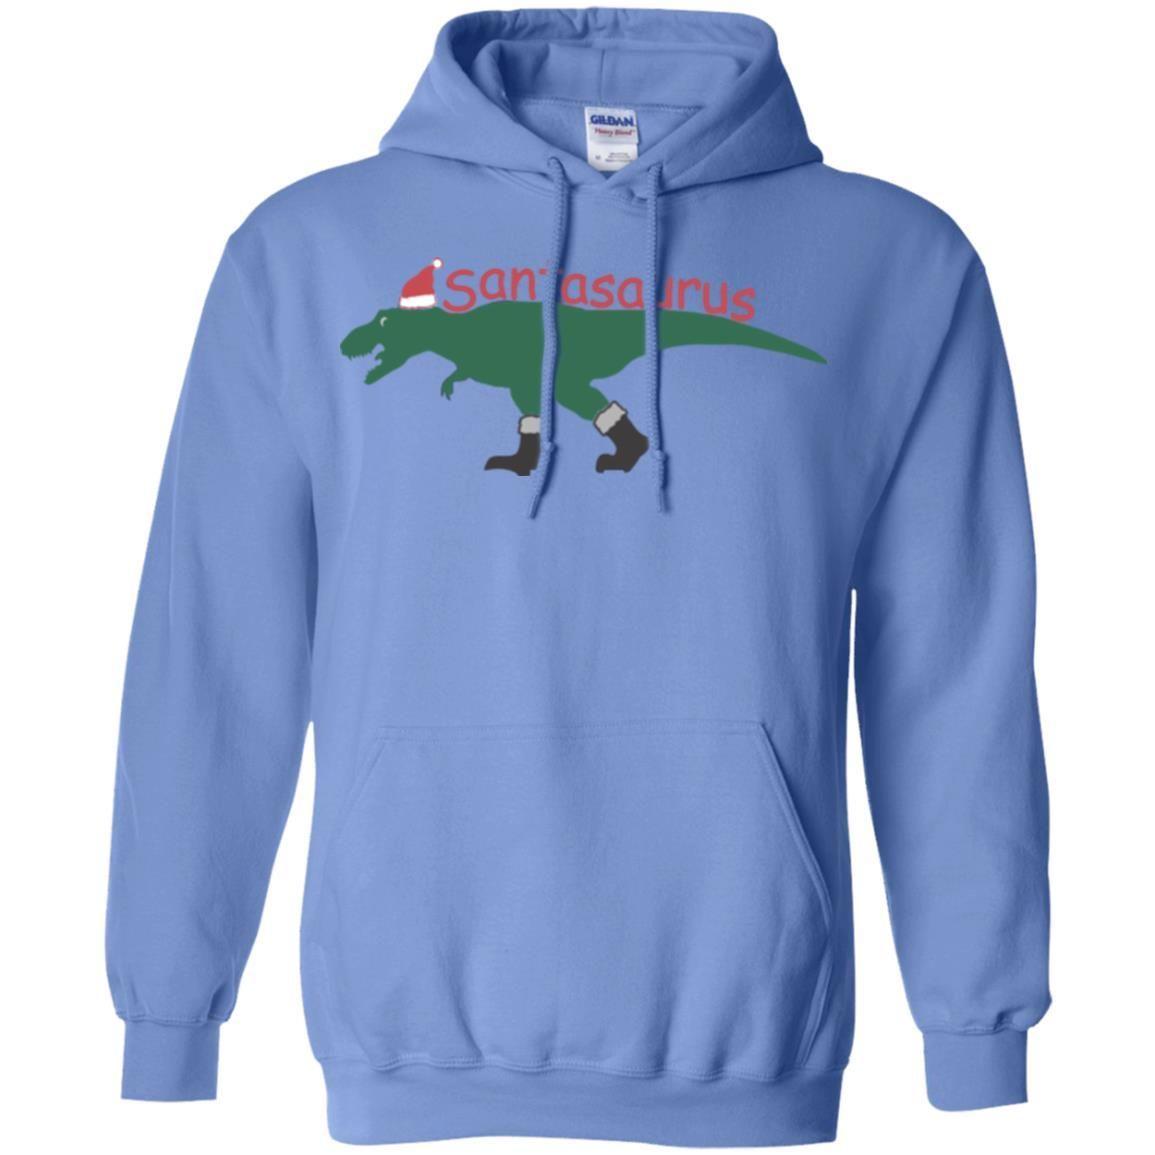 Cute Santasaurus T-rex Ugly Christmas Sweater T-shirt Kids